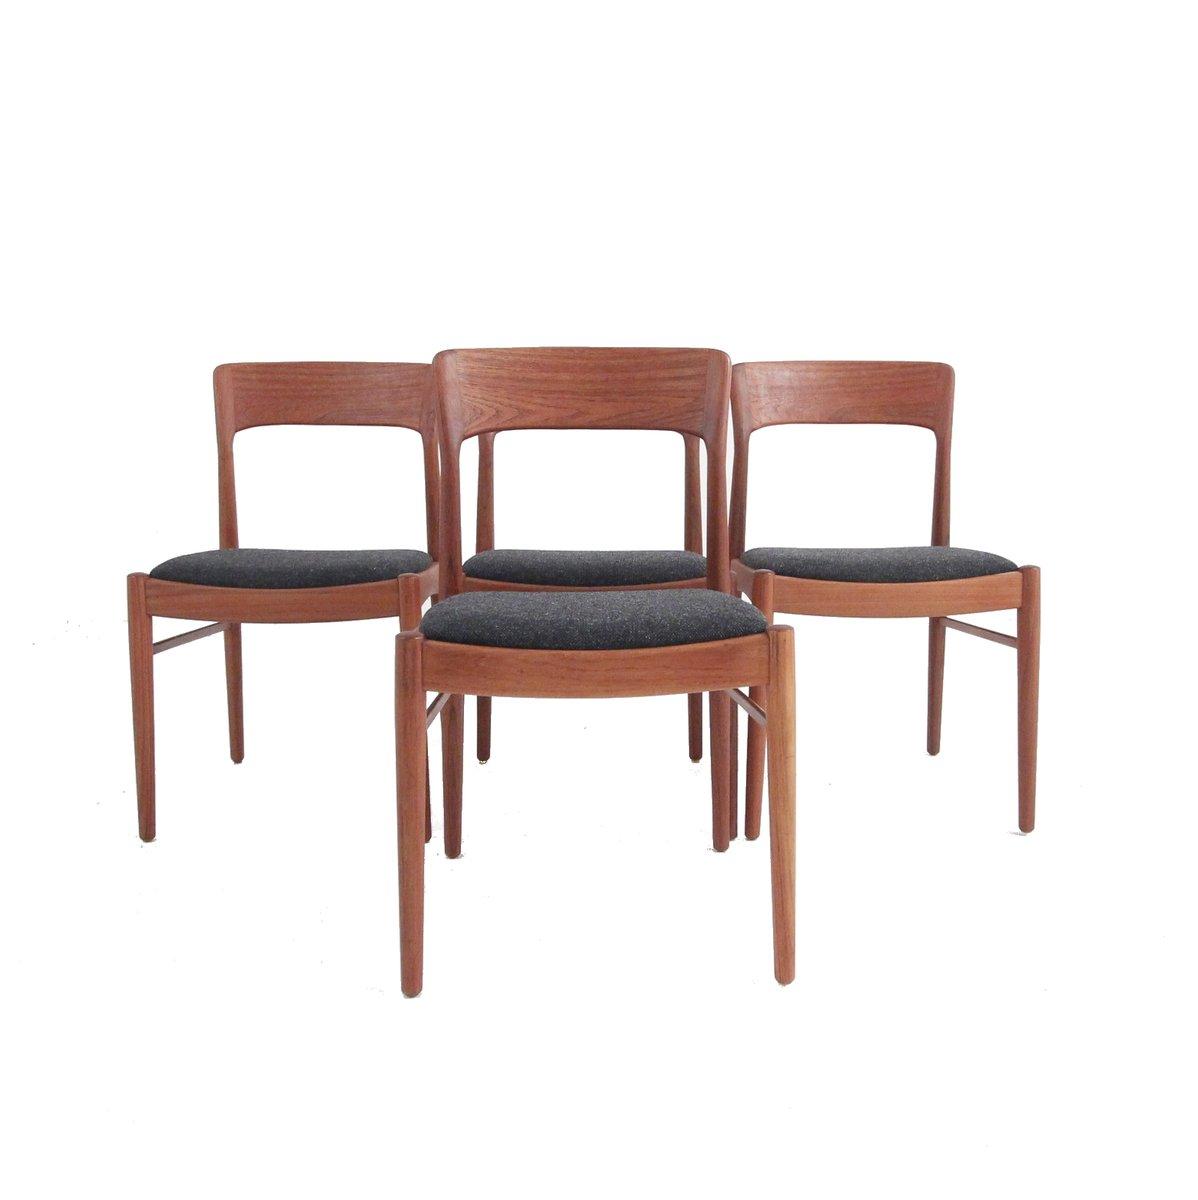 Mid century danish dining chairs from korup stolefabrik set of 4